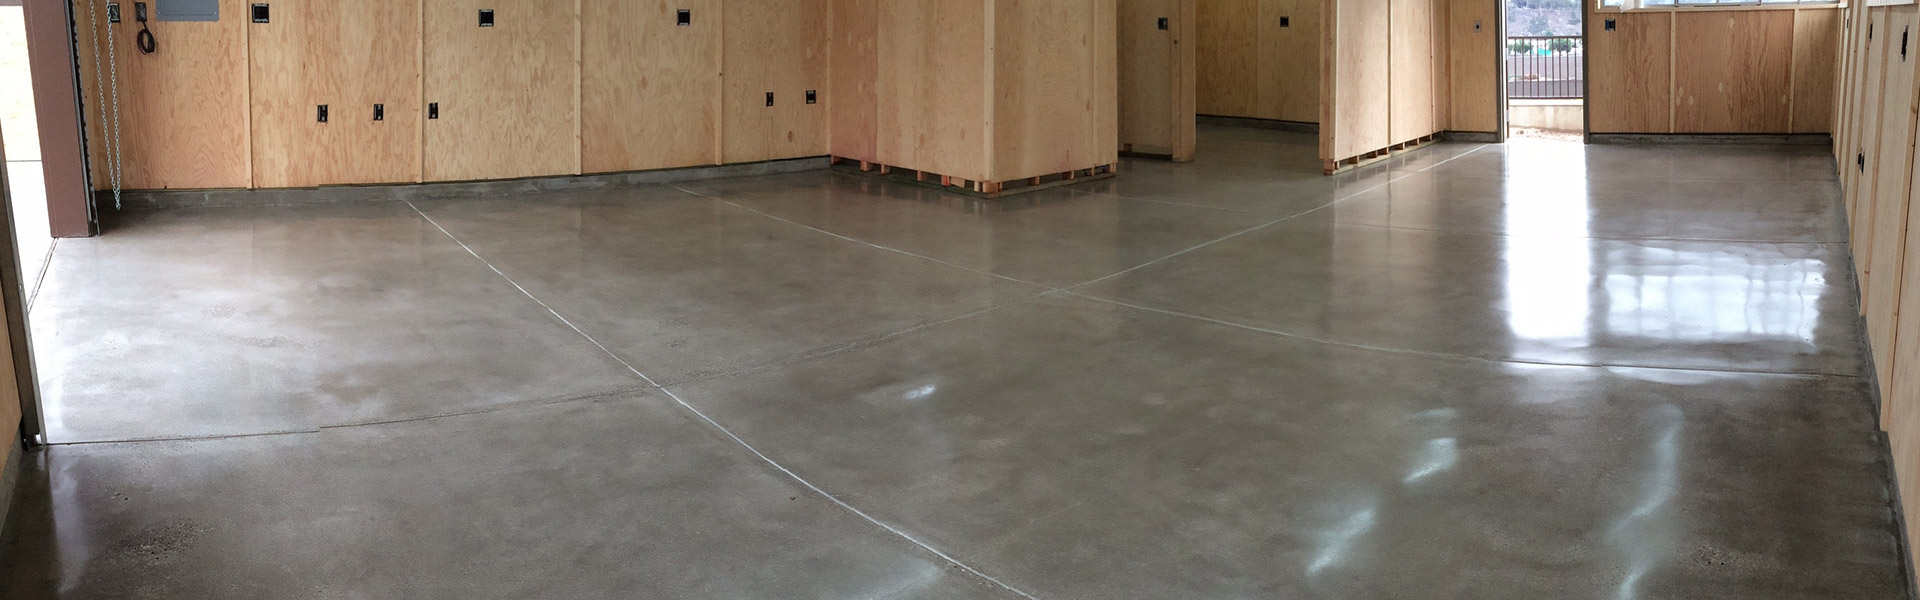 Polished Concrete  Floor Polishing Ventura County  Santa Barbara